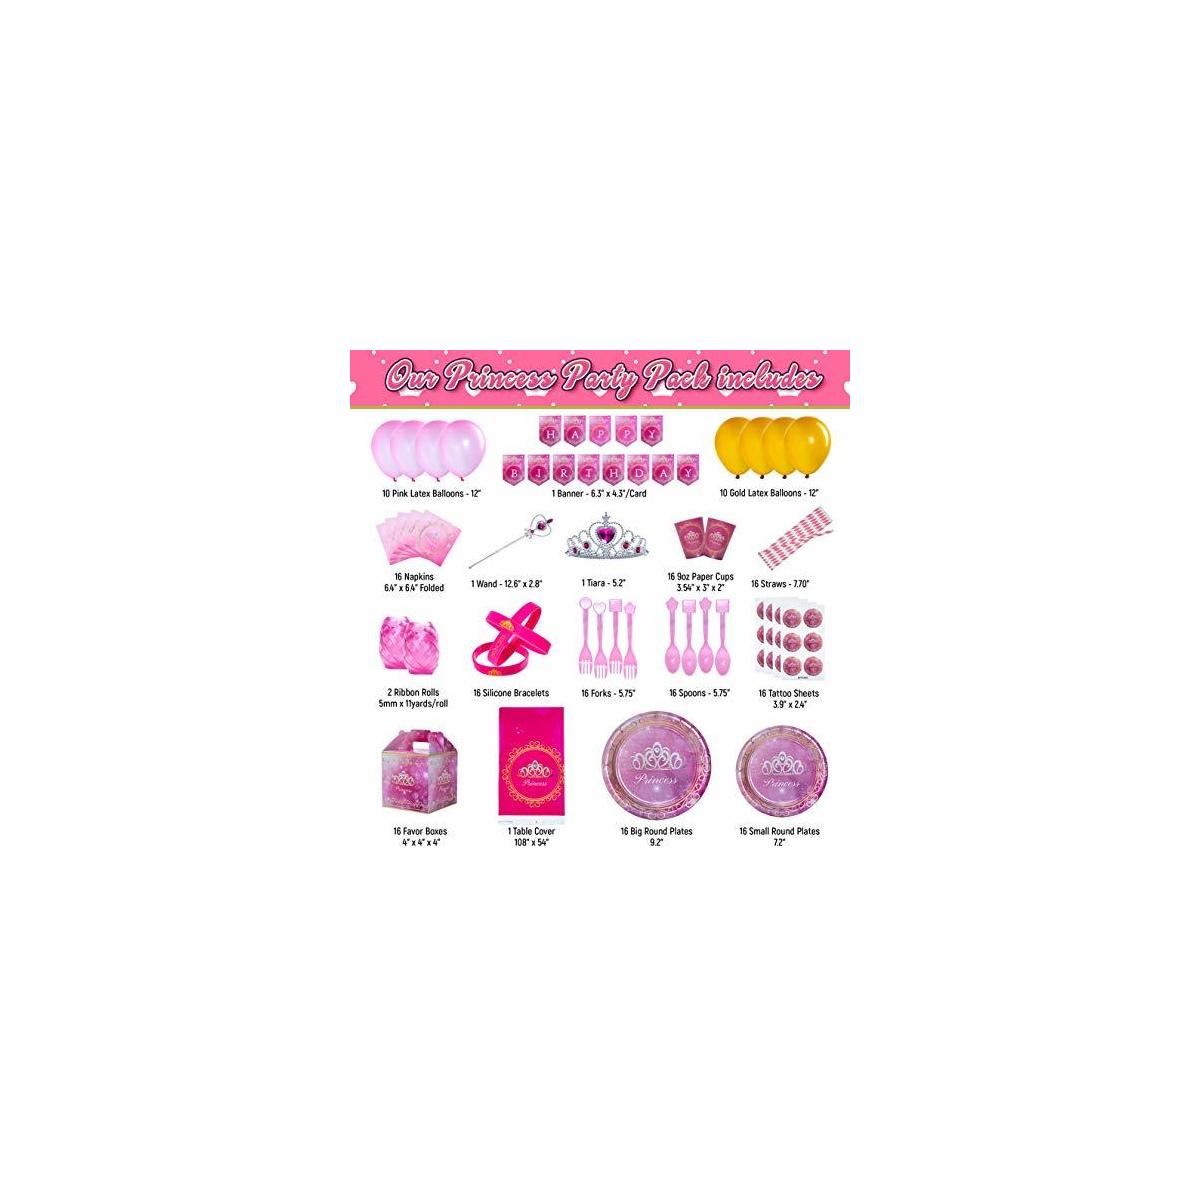 Kidohub Princess Birthday Party Supplies 186 Pcs